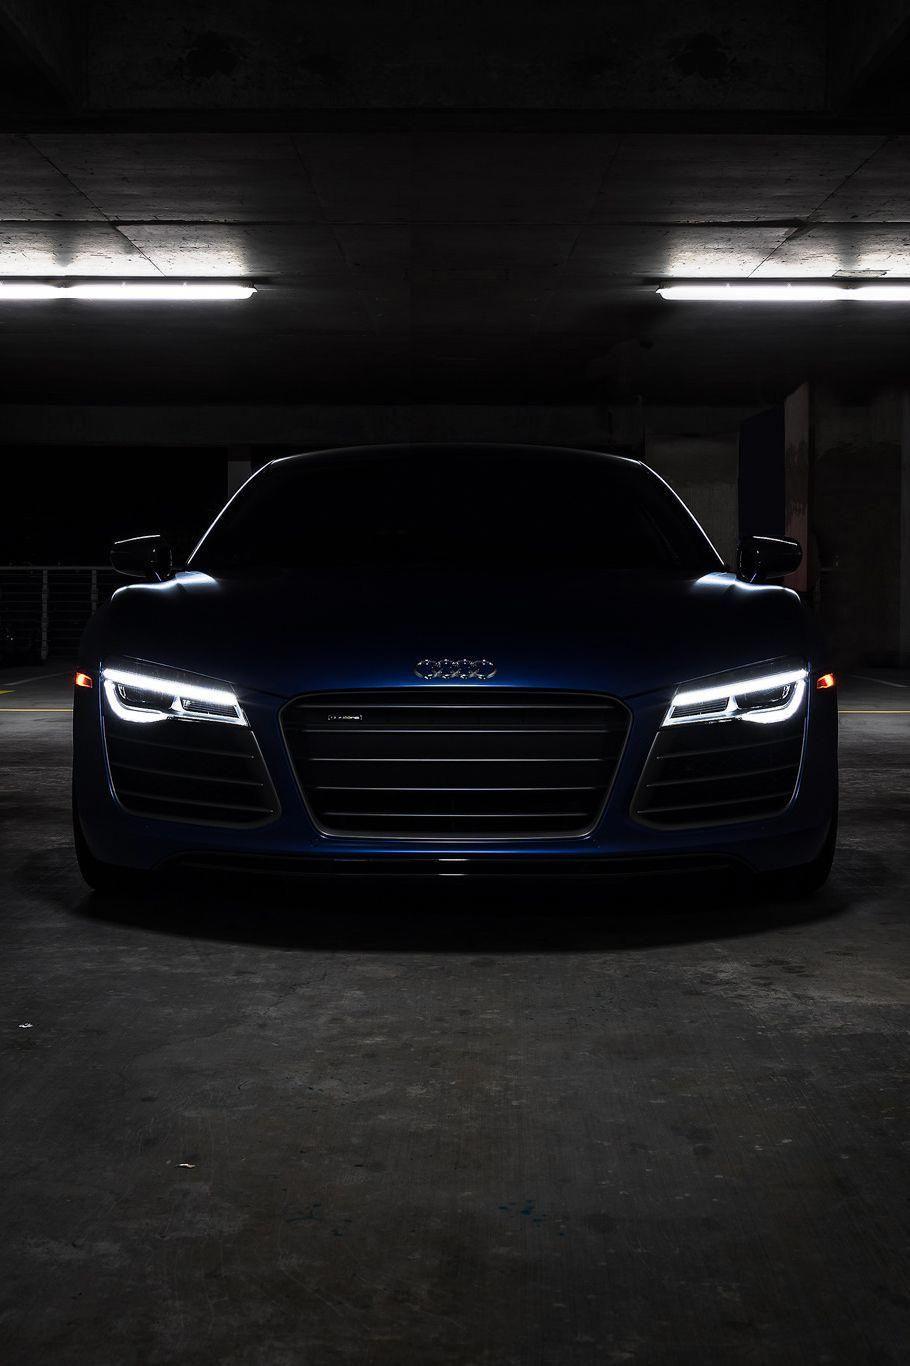 Audi R8 V10 Plus Amazing What A Beauty Luxurycars Luxury